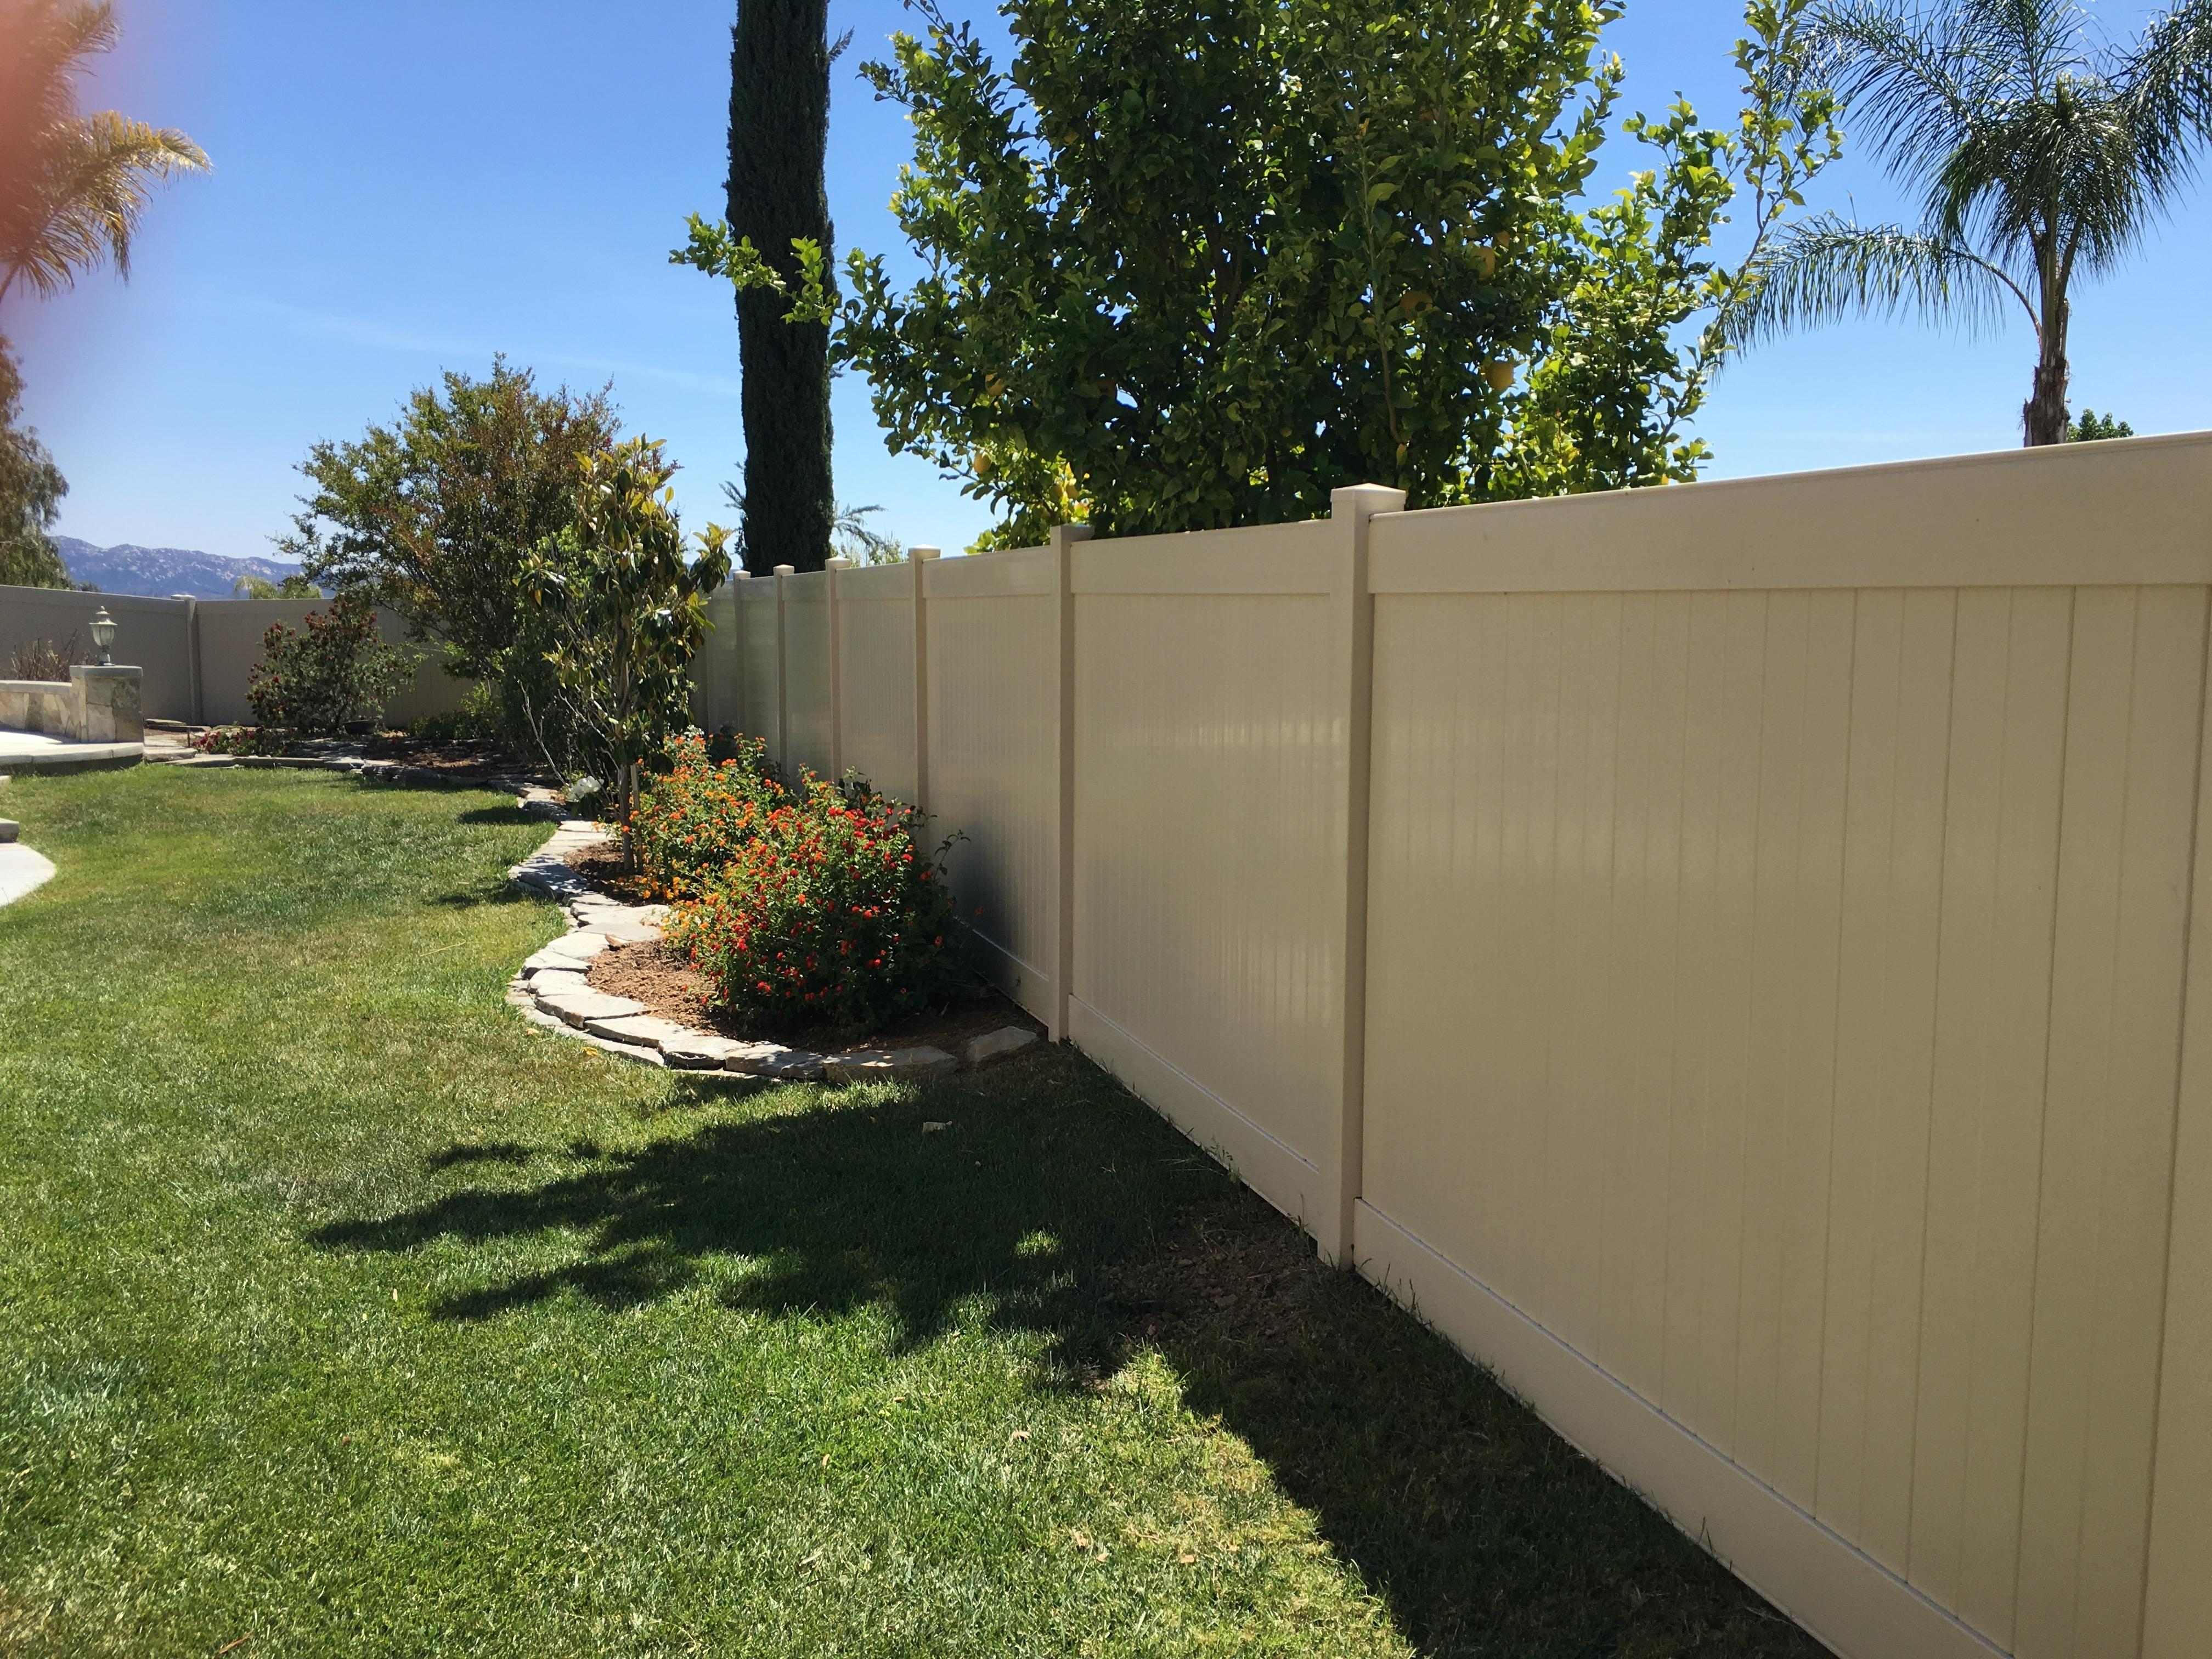 3T Fence image 18